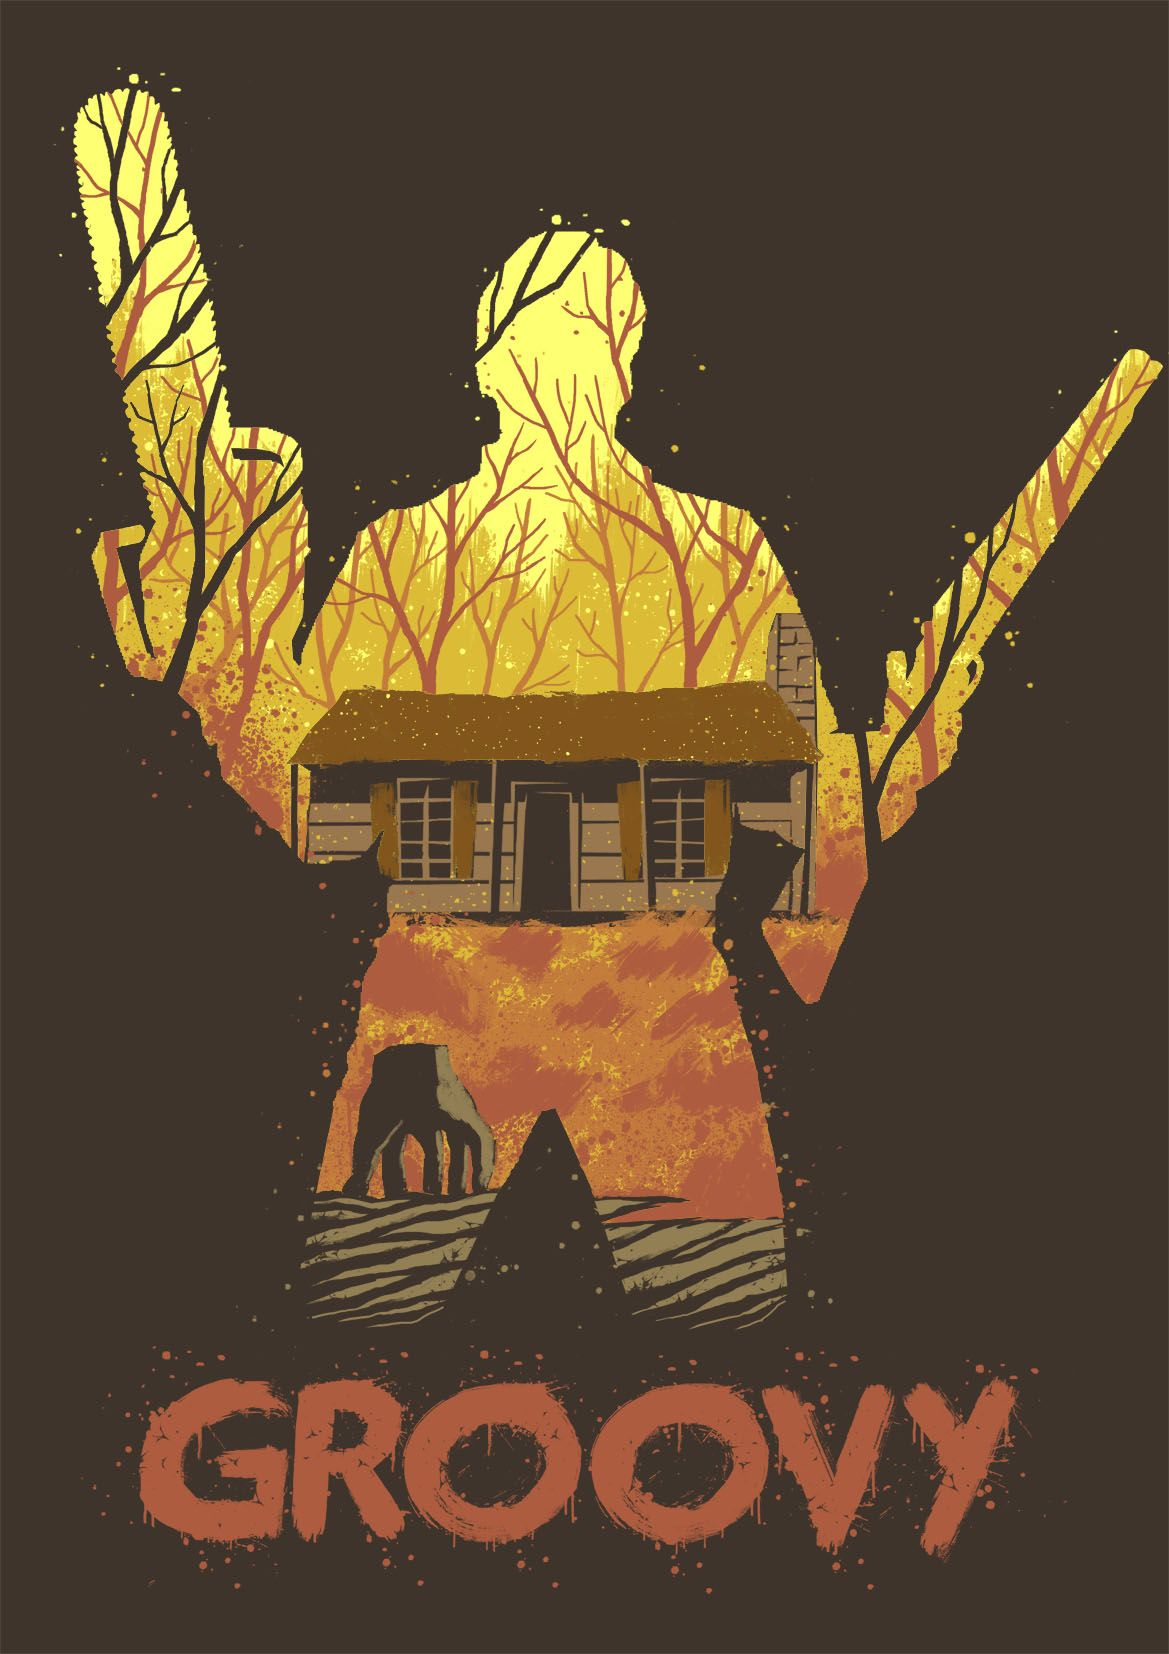 Ash Vs Evil Dead T Shirt Design For Qwertee Com Please Vote And